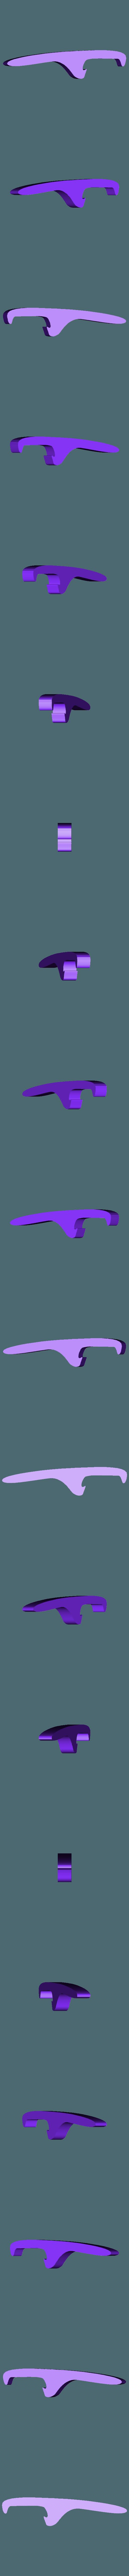 bottle_opener.stl Download free STL file Bottle Opener (without metal) • 3D printer template, Urgnarb